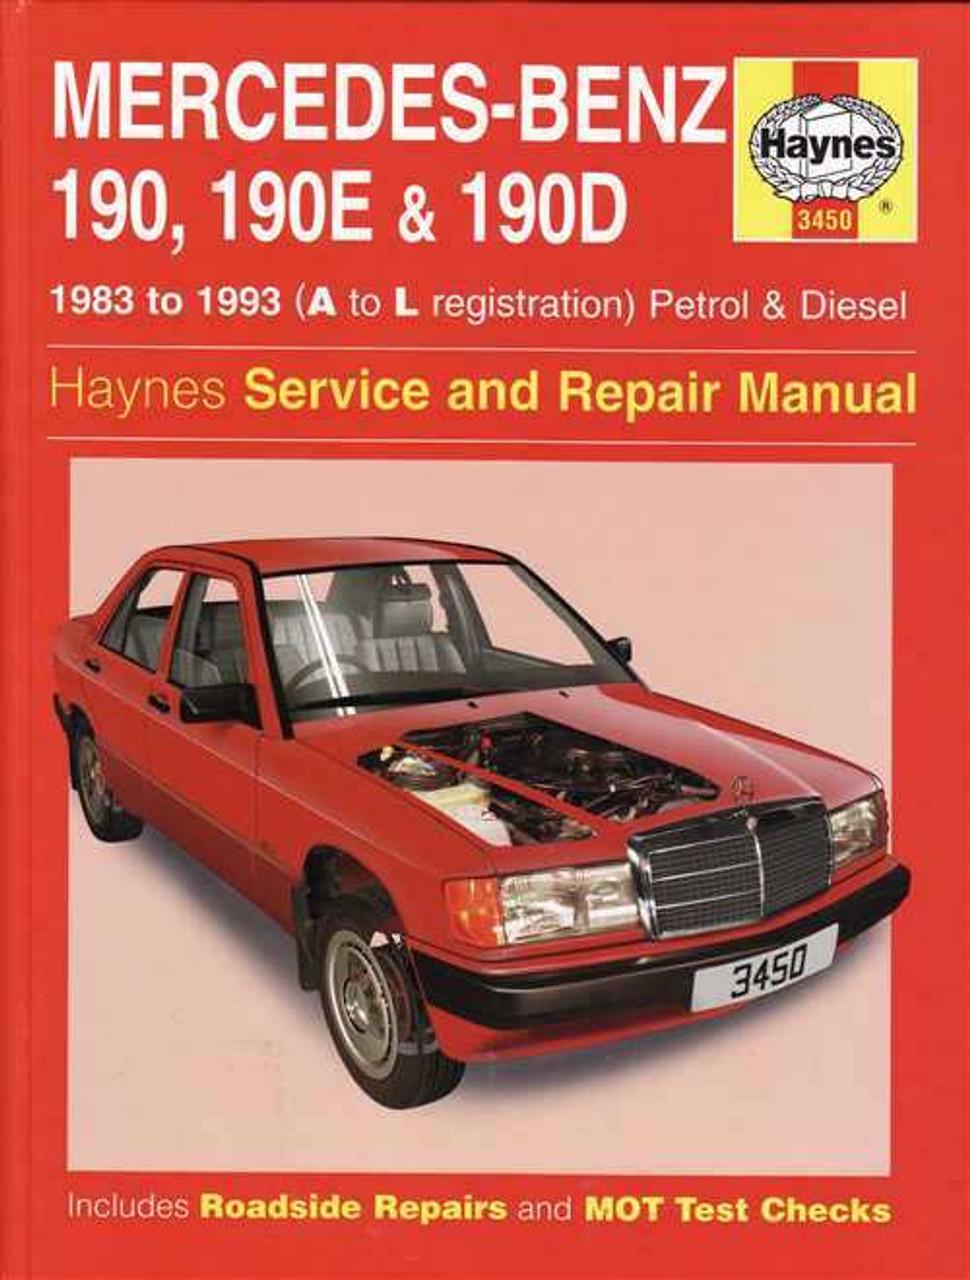 medium resolution of mercedes 450sel 6 9 in addition 1993 mercedes 190e engine diagram mercedes 190e 2 6 engine diagram